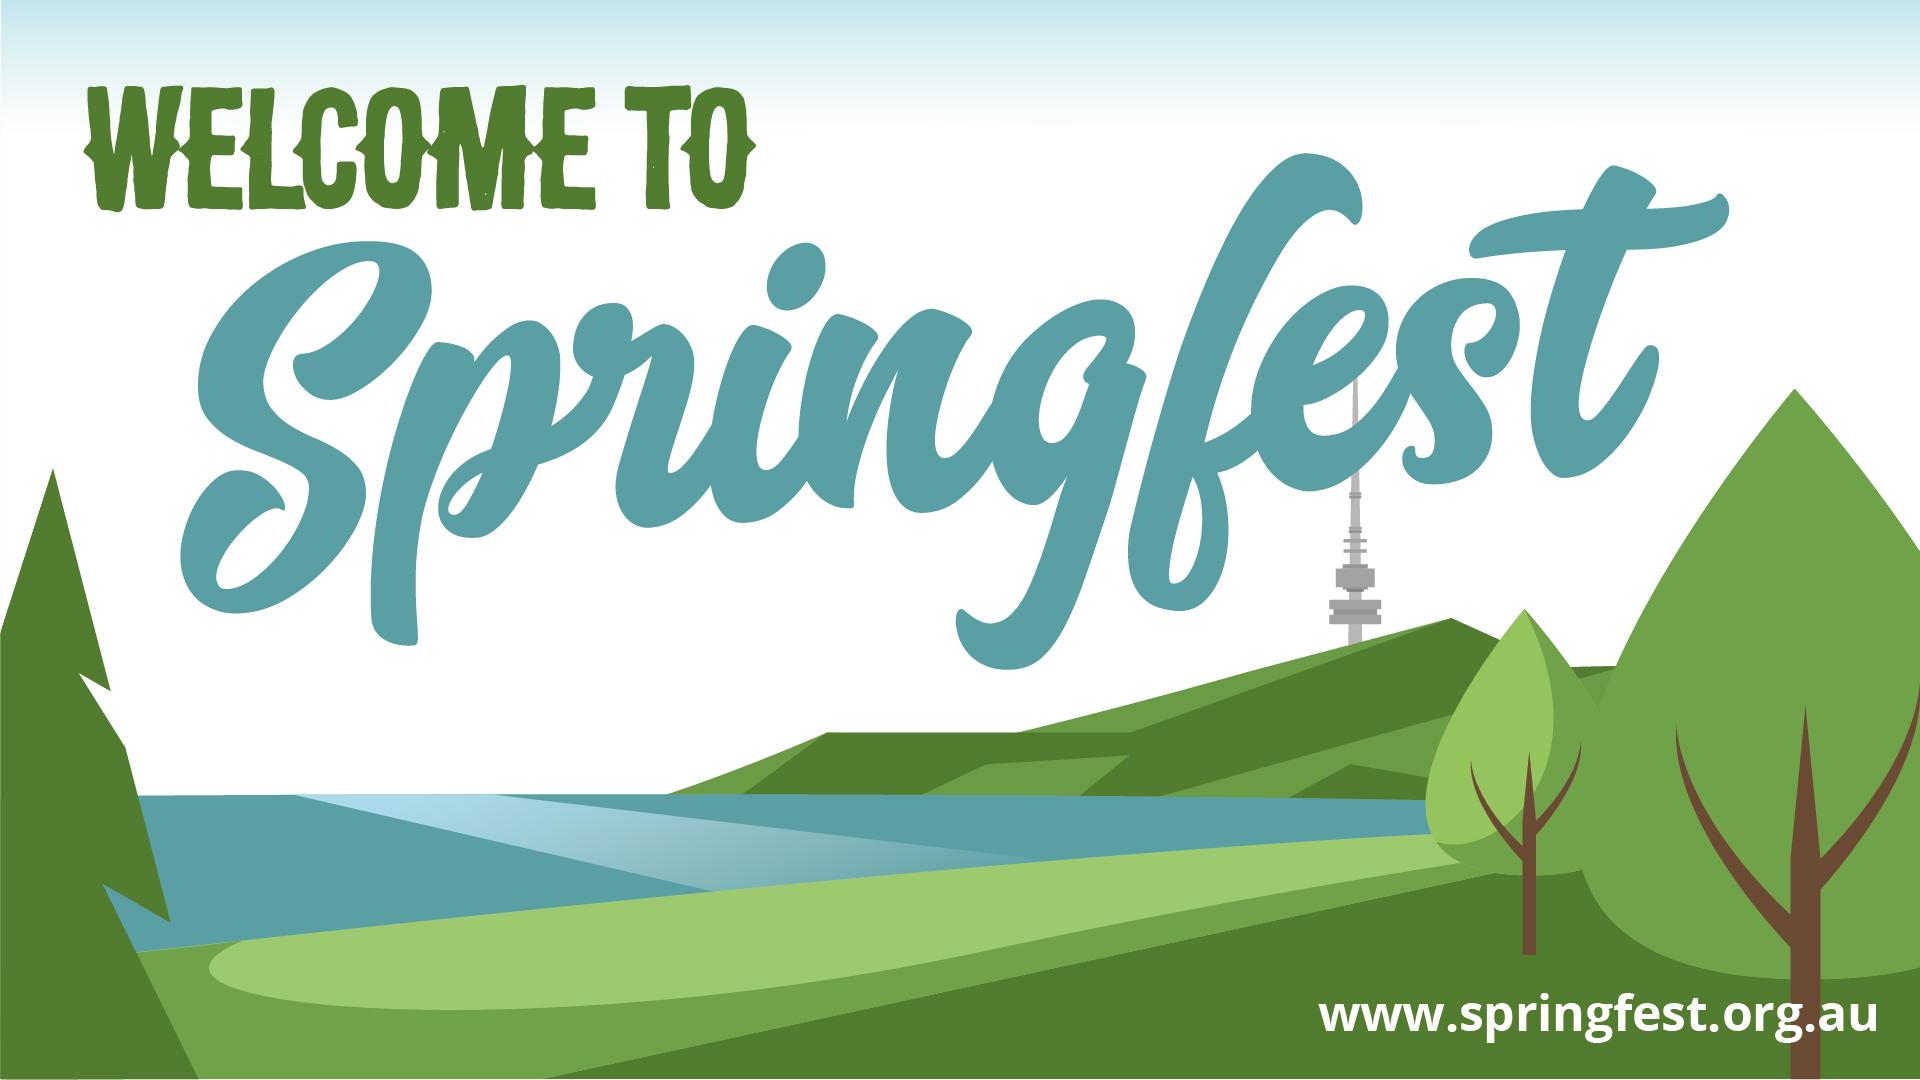 Springfest-Welcome.jpg